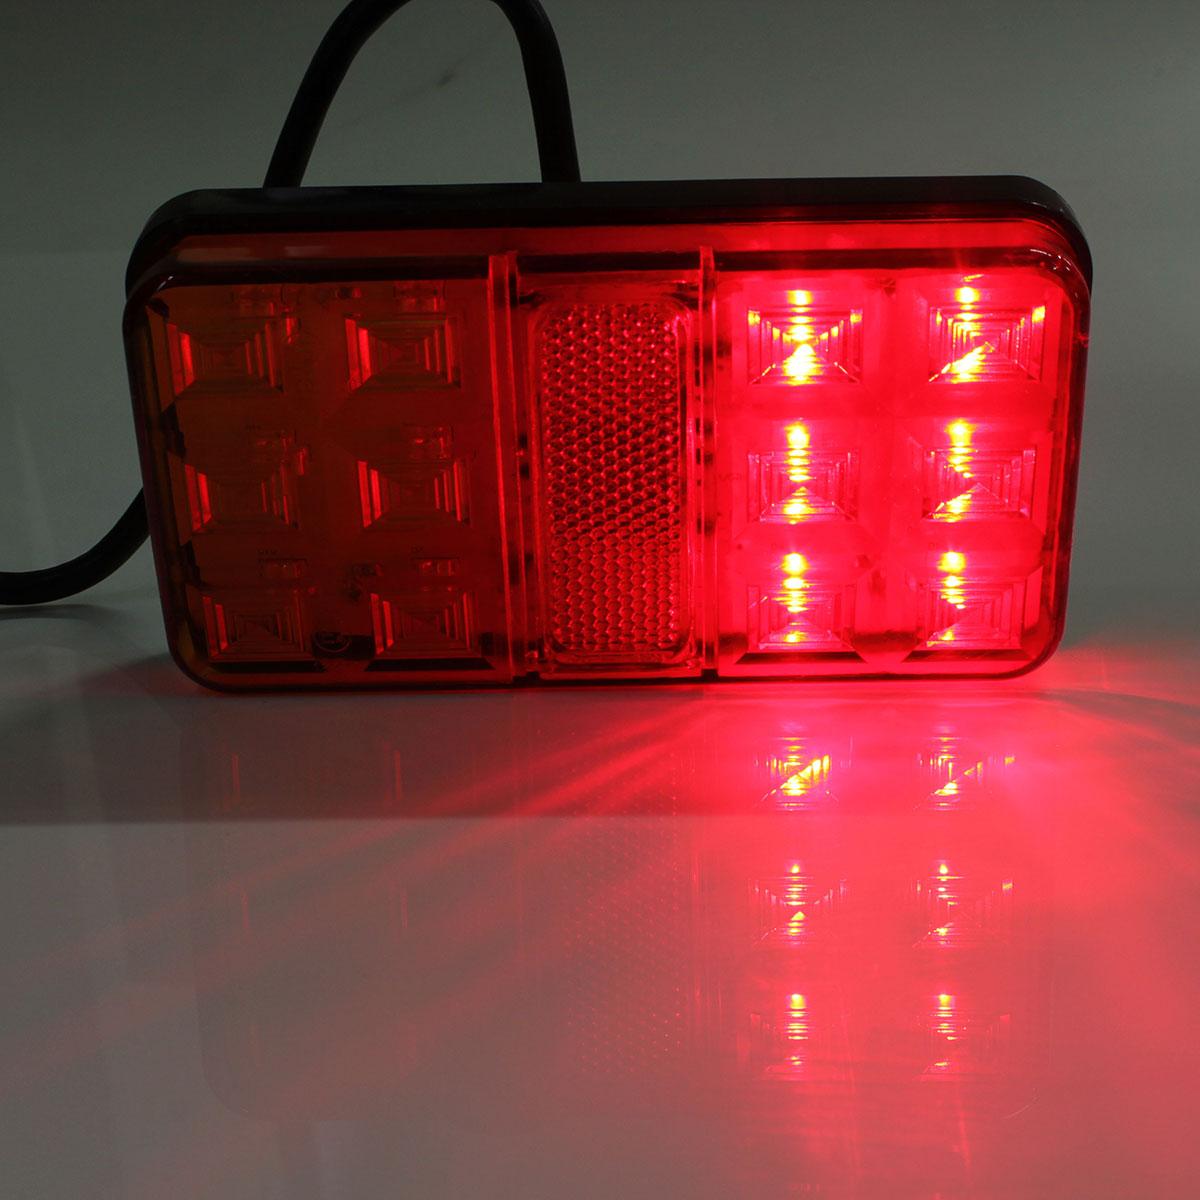 Amazing Trailer Indicator Lights Not Working Ideas - Everything You ...